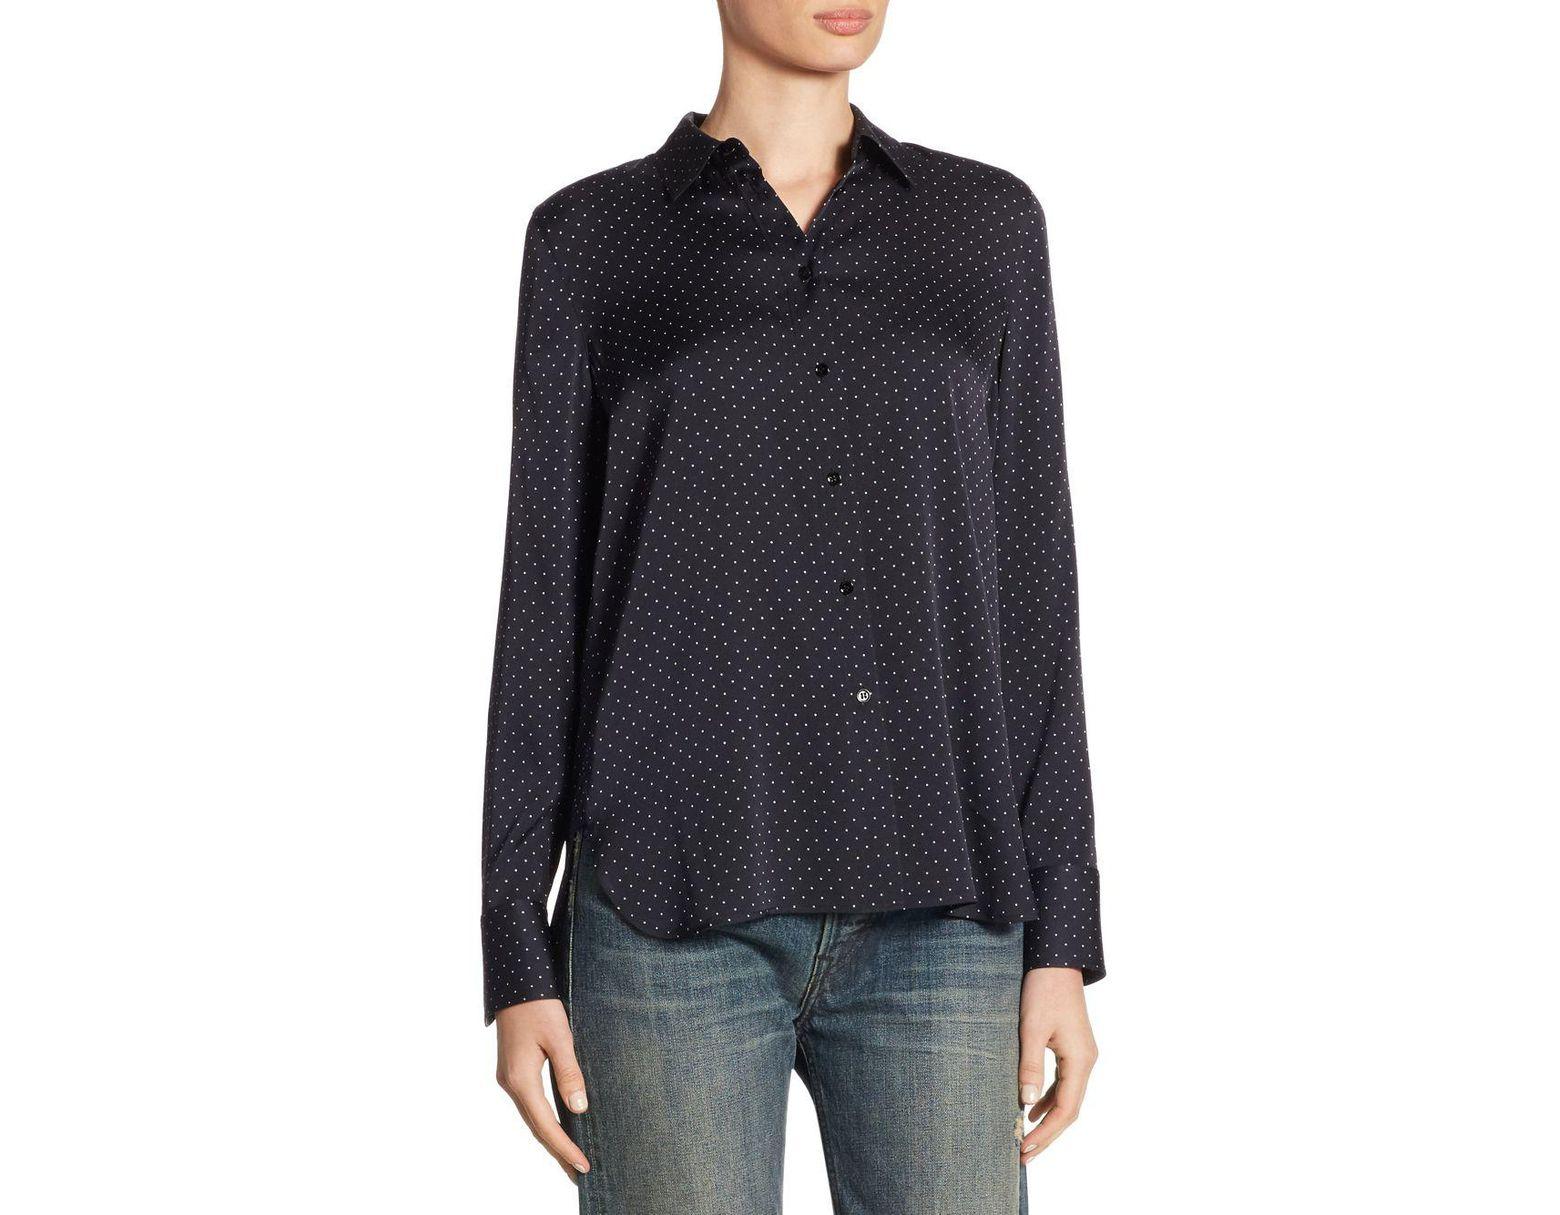 51e26560330f93 Vince Vintage Polka Dot Silk Blouse in Black - Save 9% - Lyst